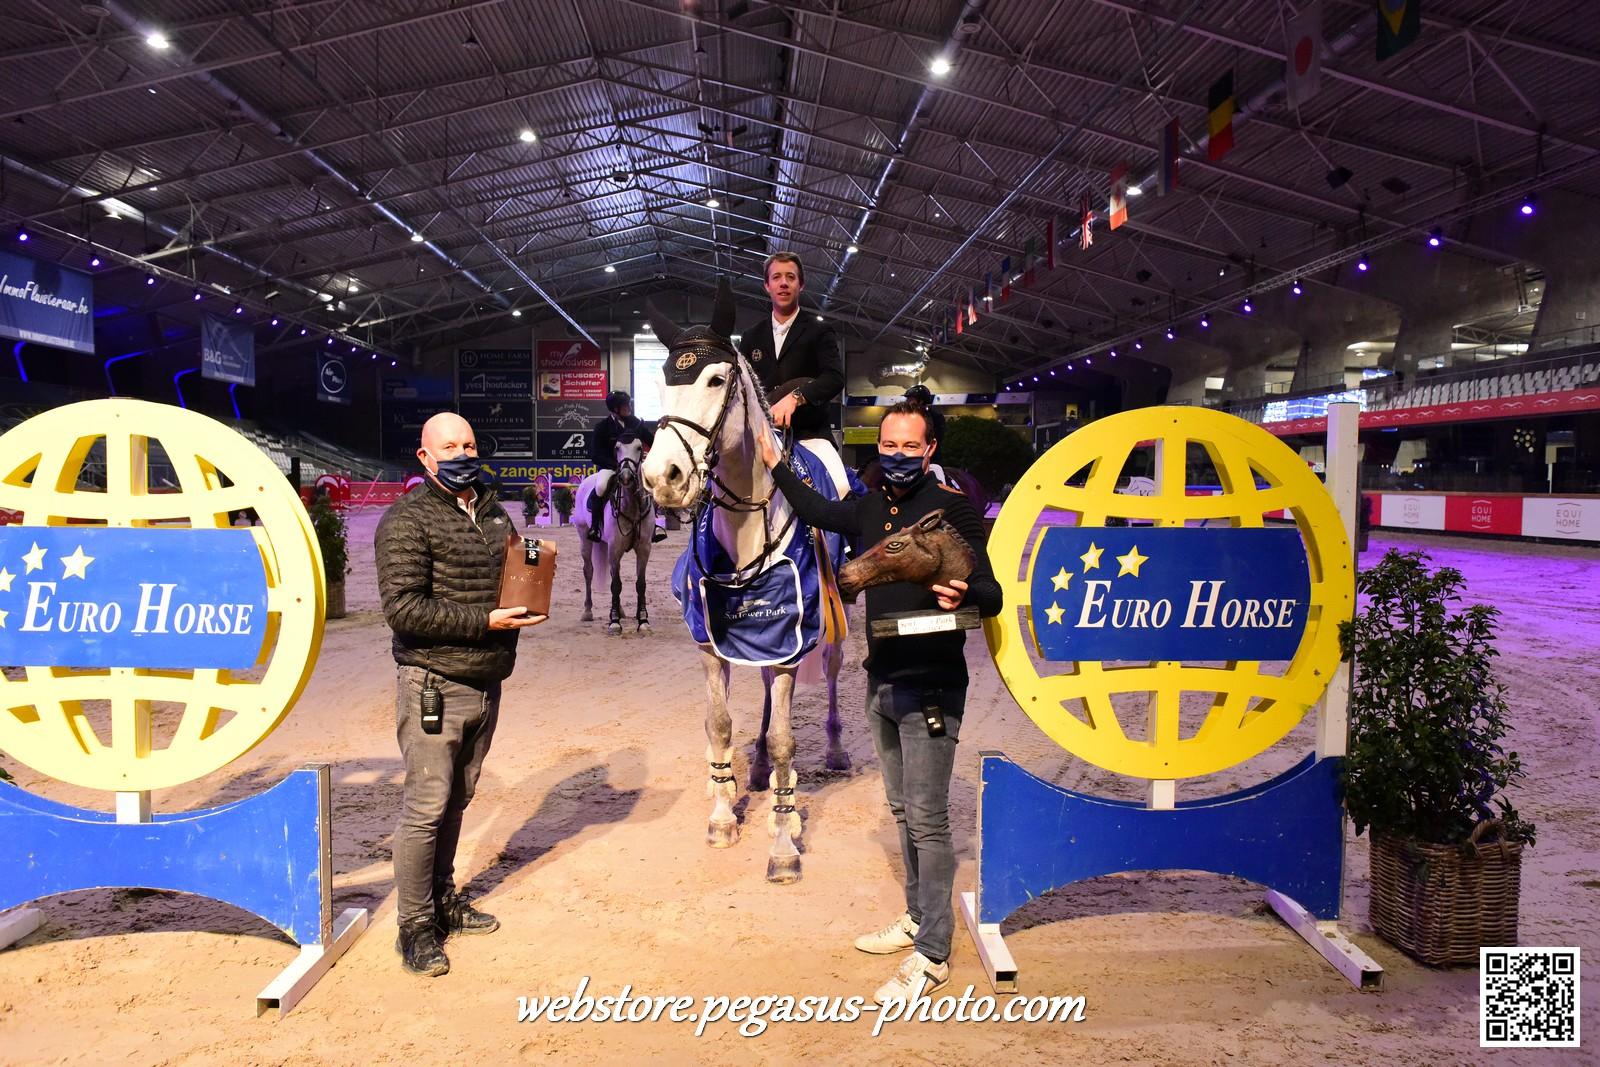 Dutch riders dominate LR of Opglabbeek